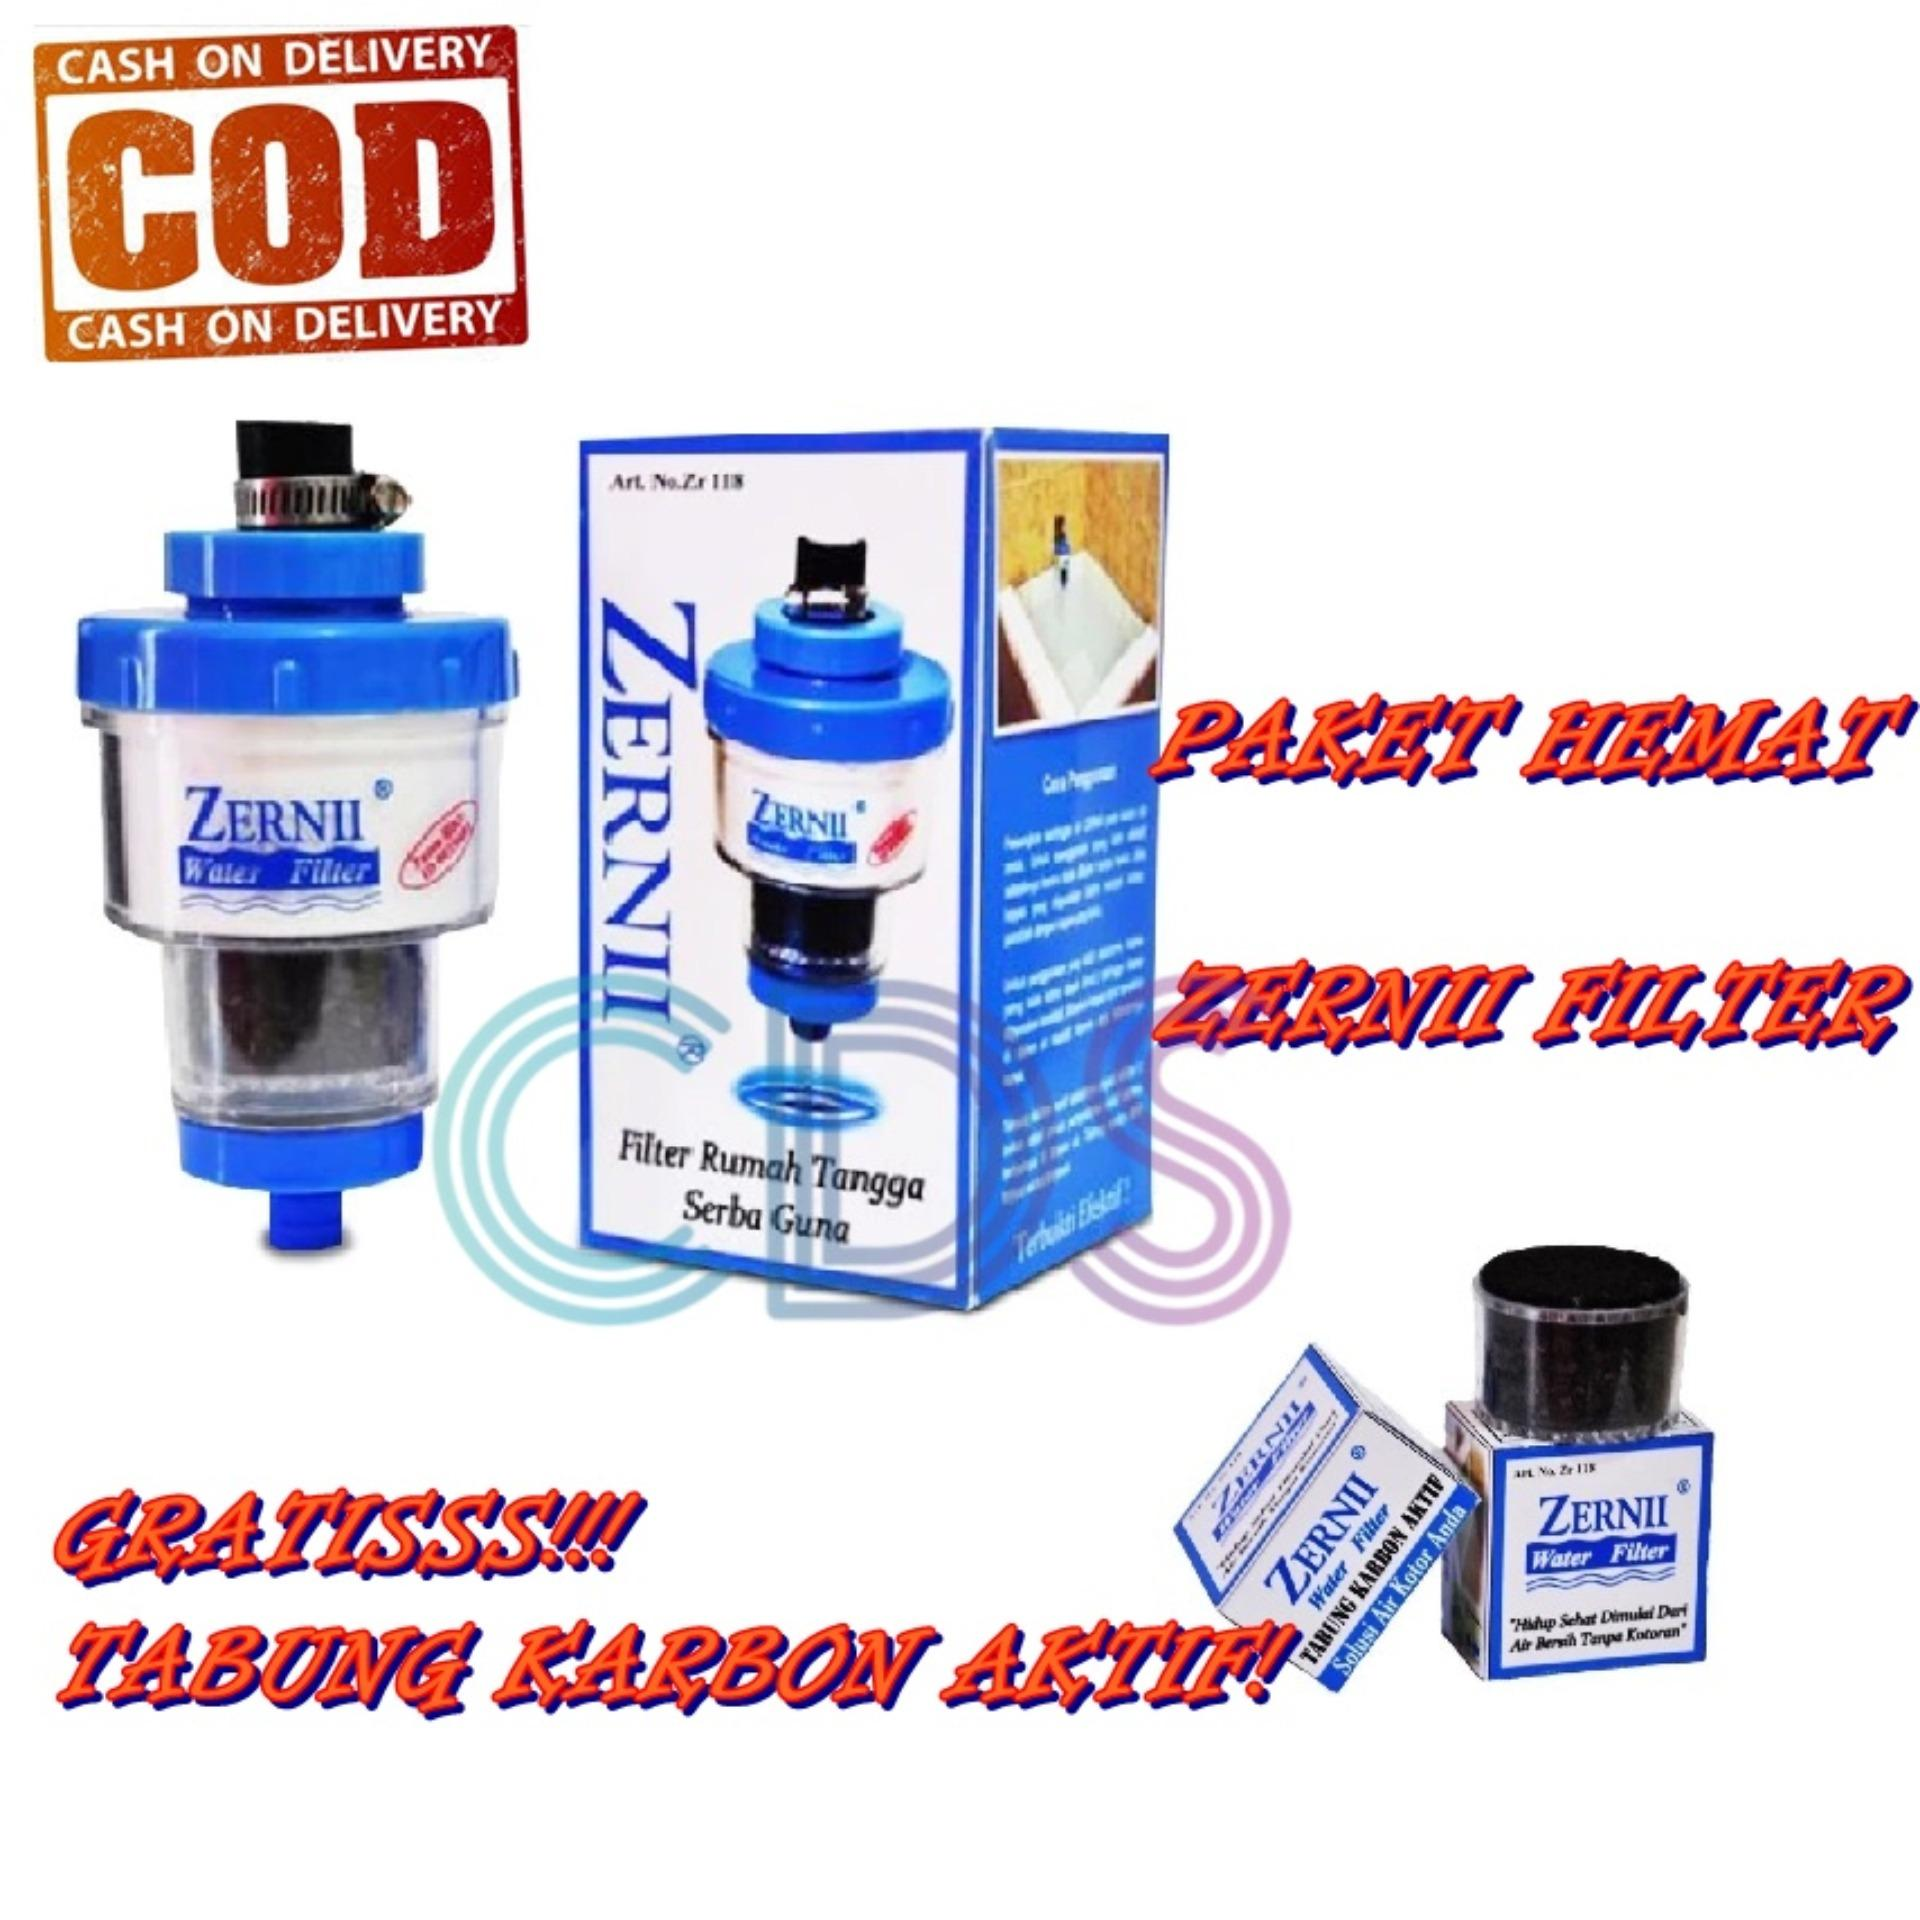 Paket HEMAT Zernii Water Filter + FREE Refill Carbon Filter Air